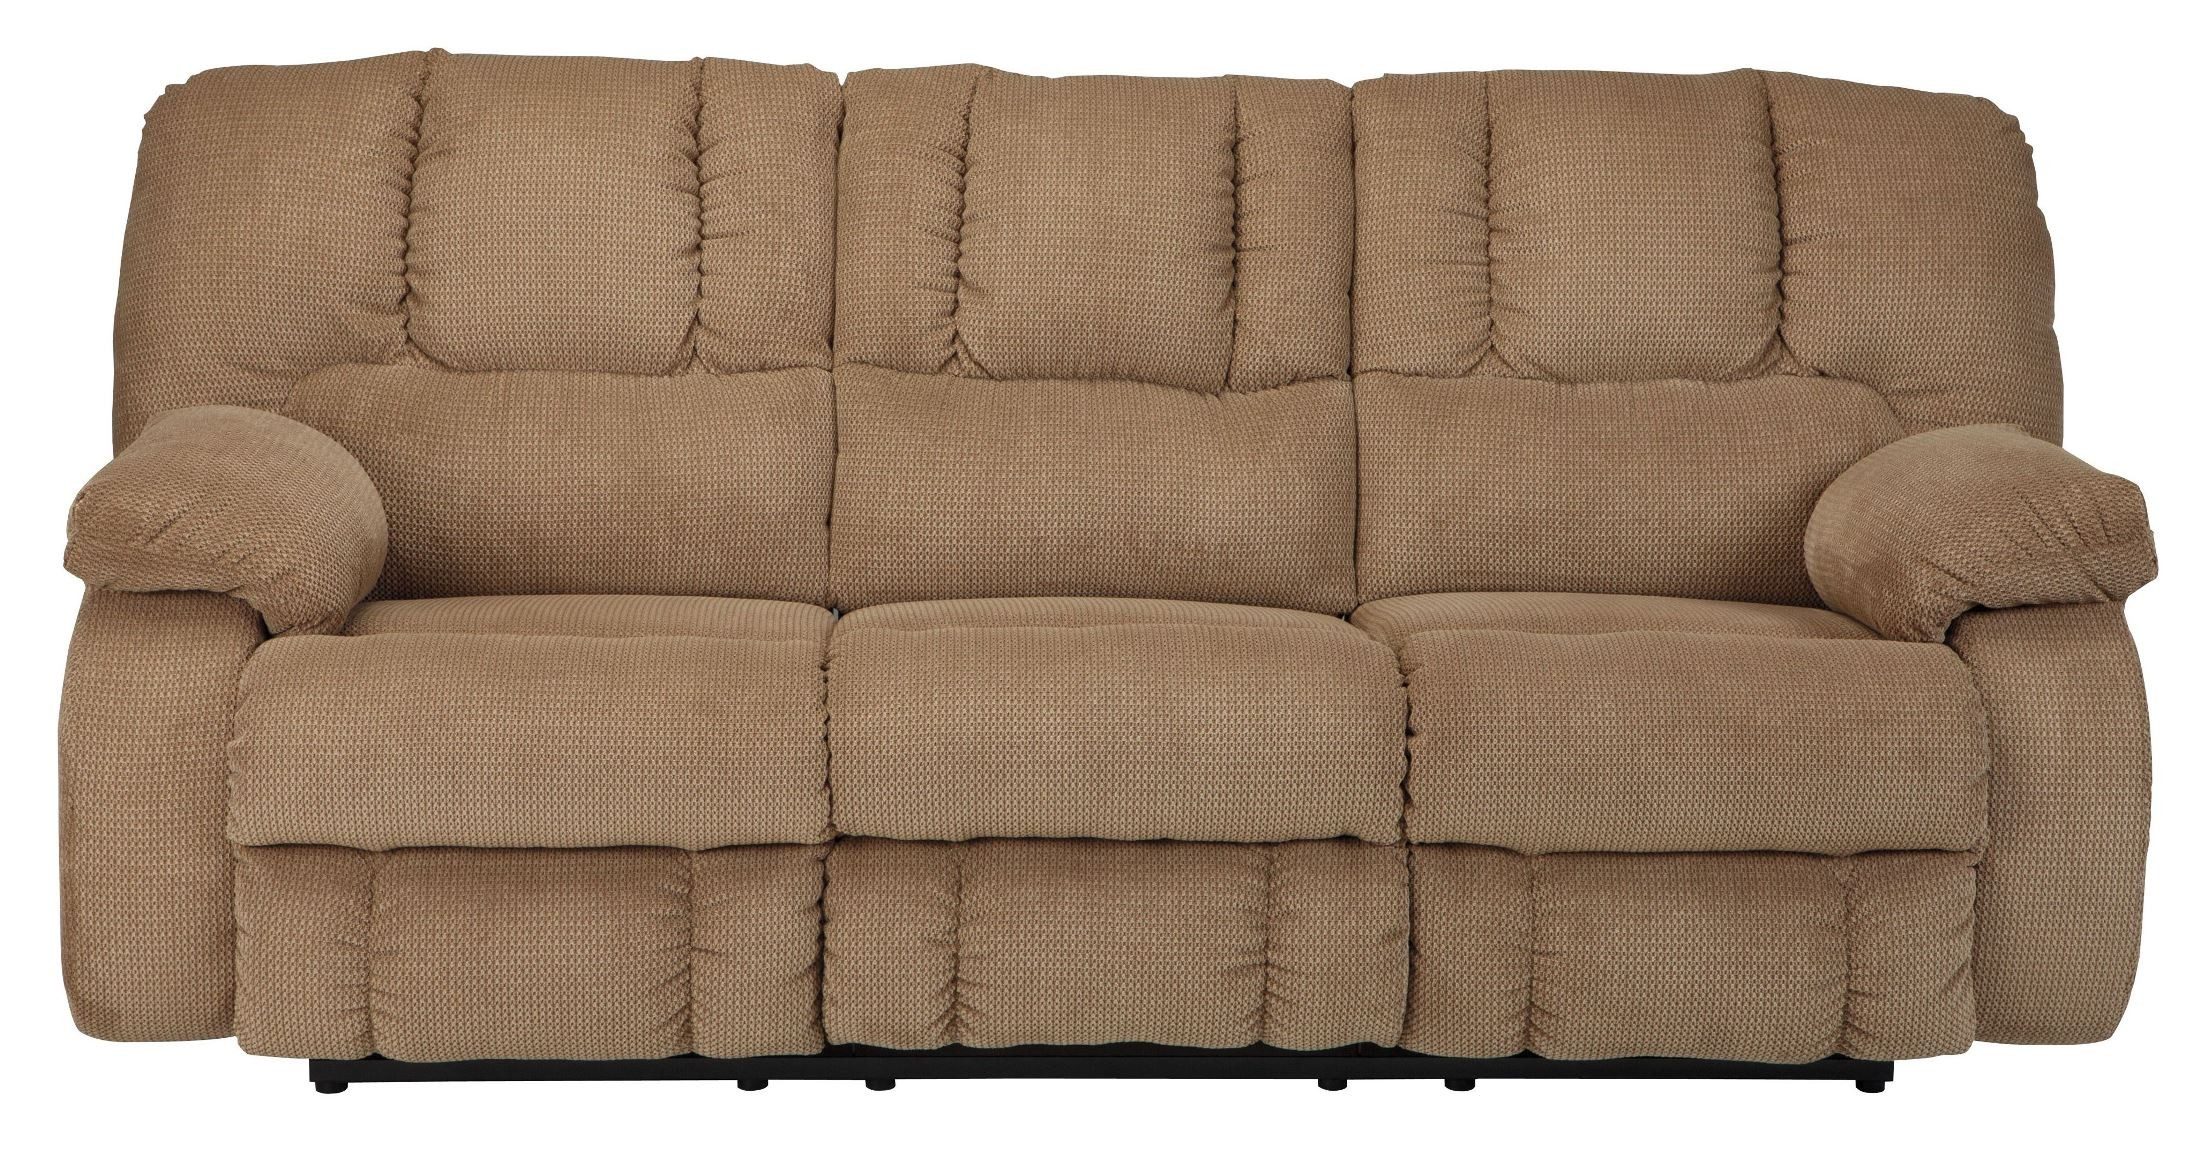 ashley furniture morandi mocha sofa green velvet couch roan reclining from 3860288 coleman